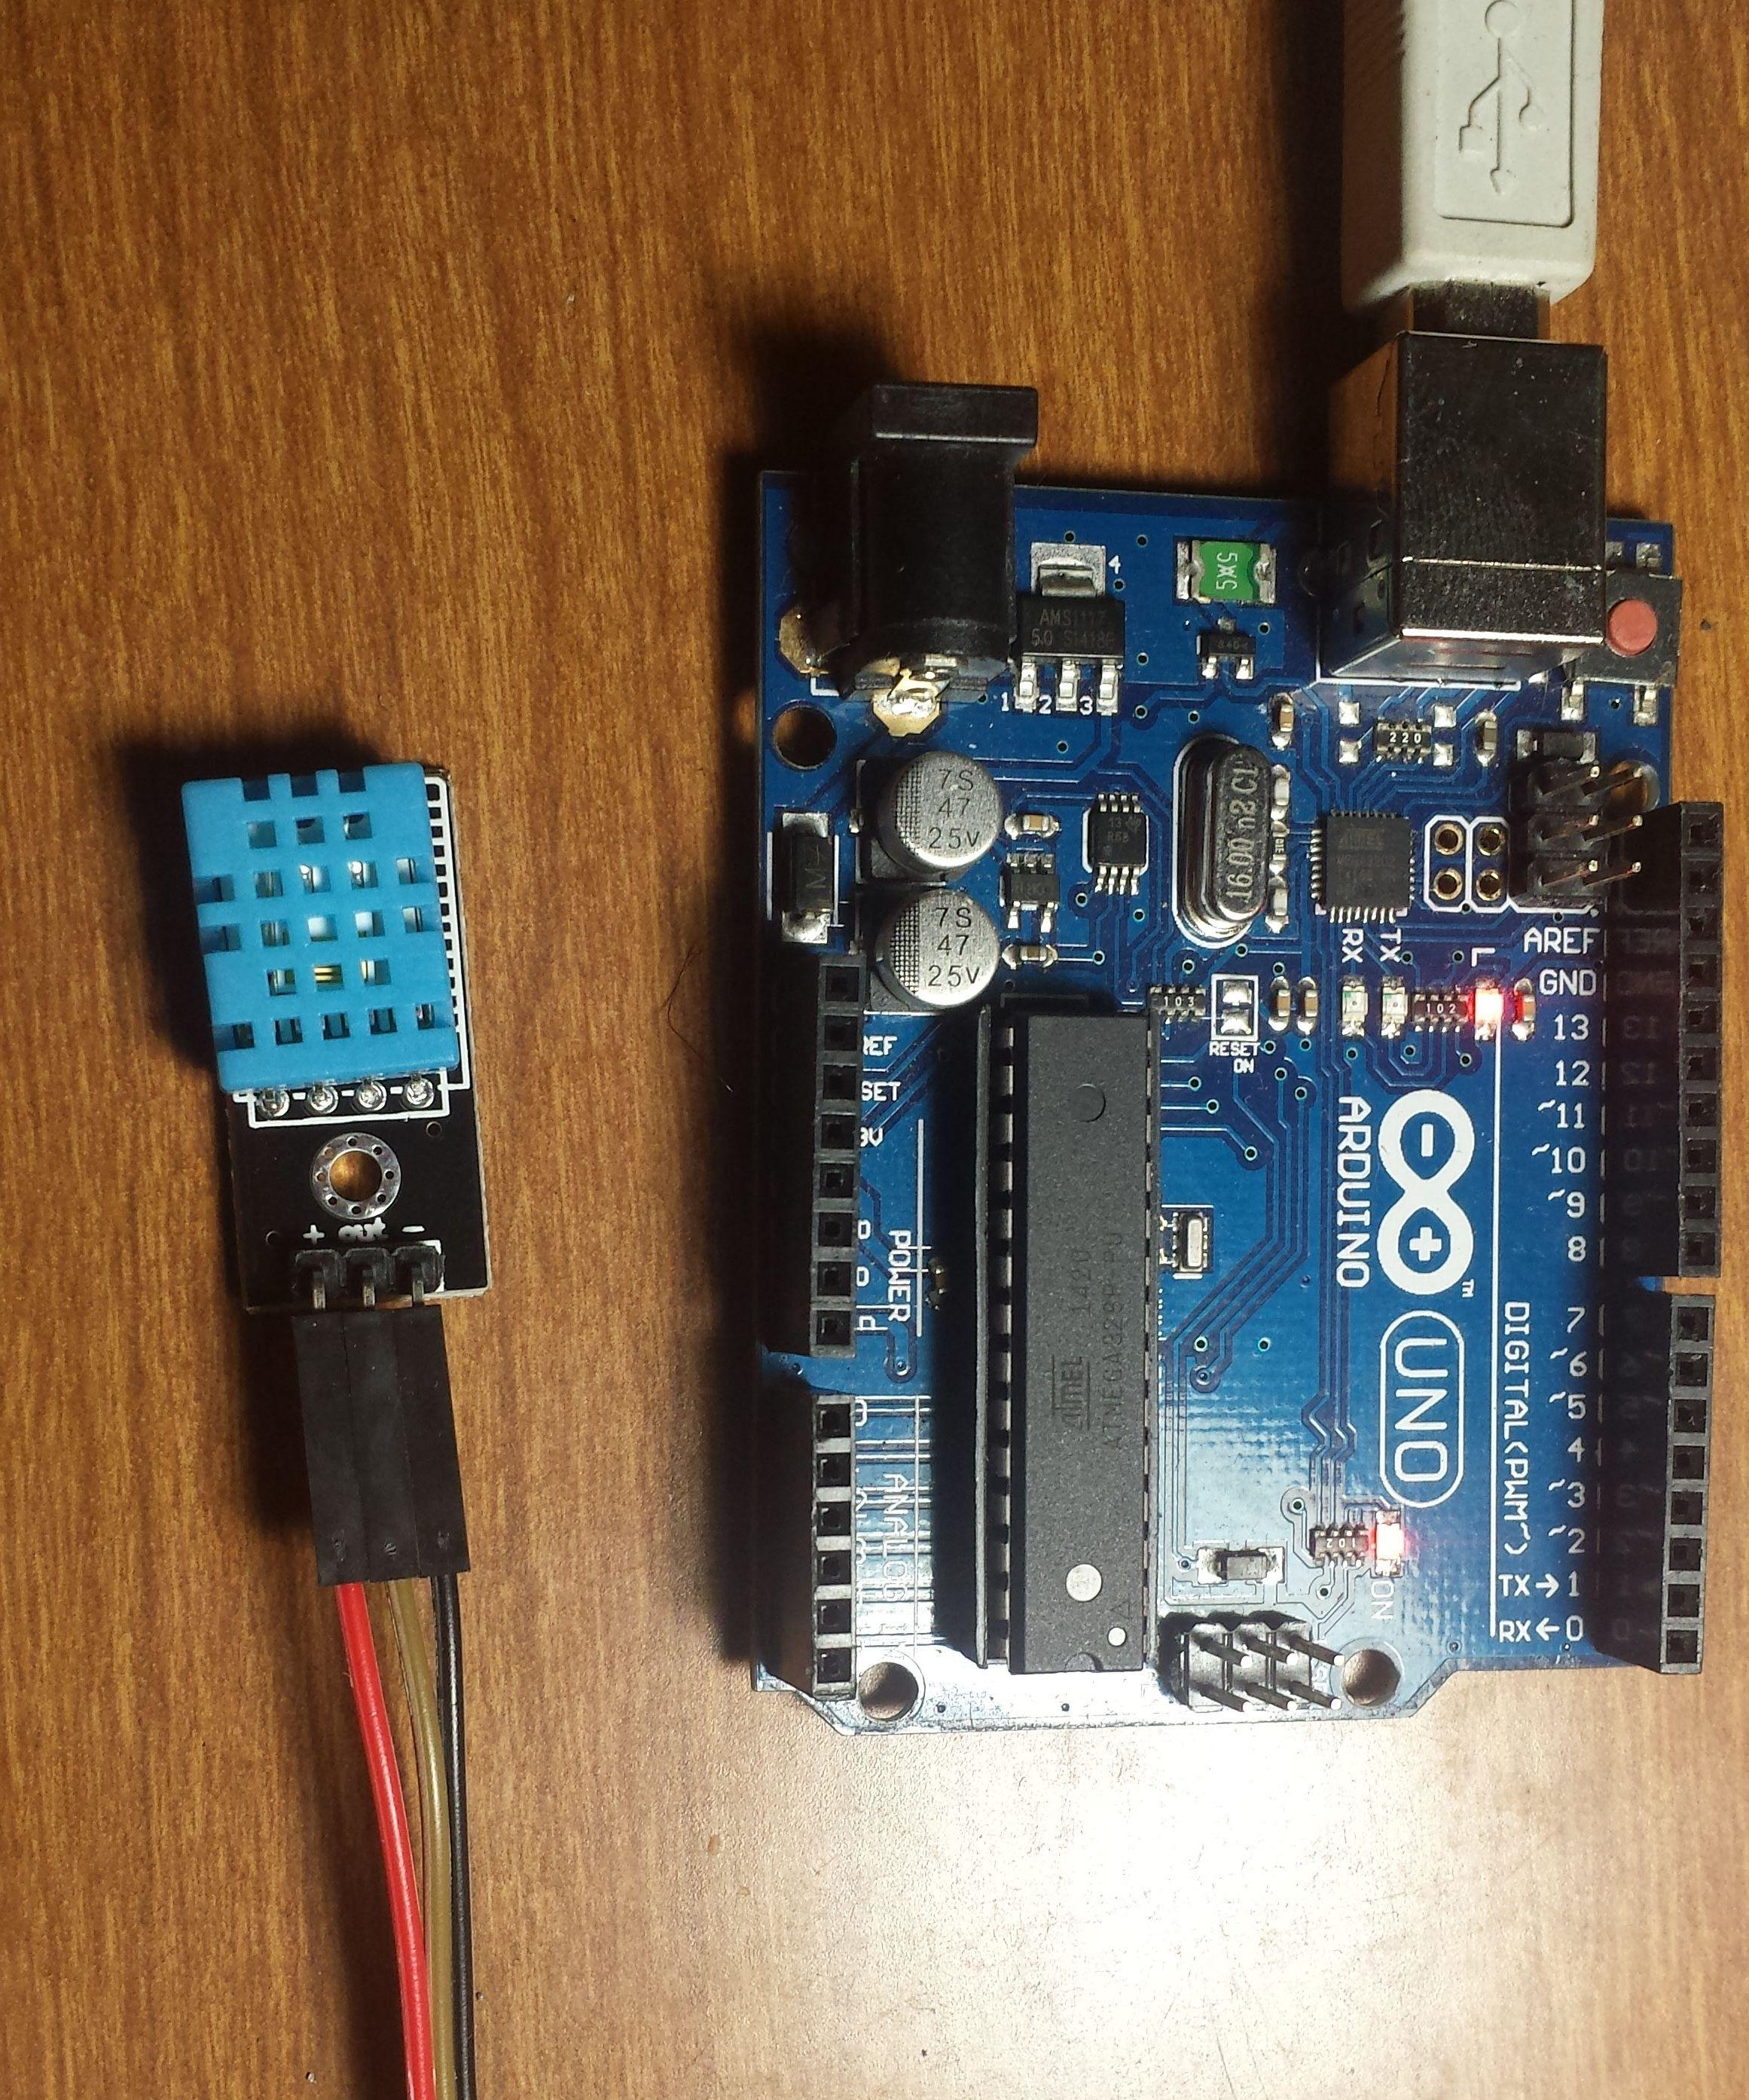 Sensor De Temperatura Y Humedad Dht11 Arduino Tech Pinterest Cool Projects Electronics And Microcontrollers Raspberry Tutorials Raspberries